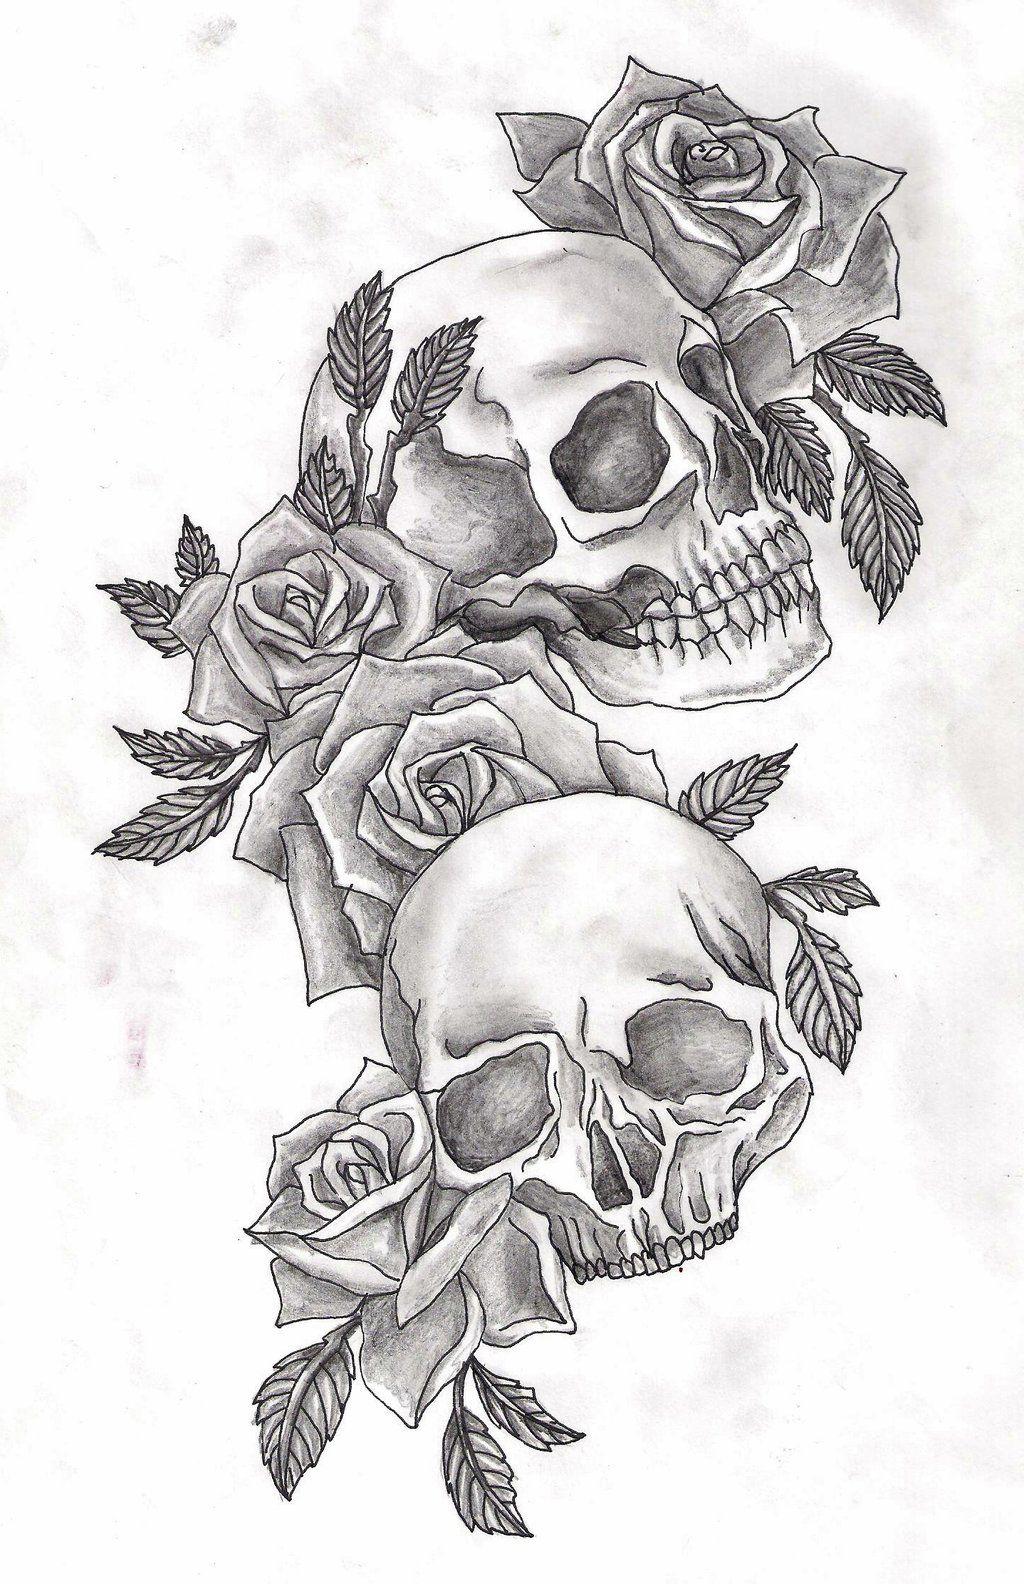 DeviantArt More Like skulls and roses by Adler666 (With